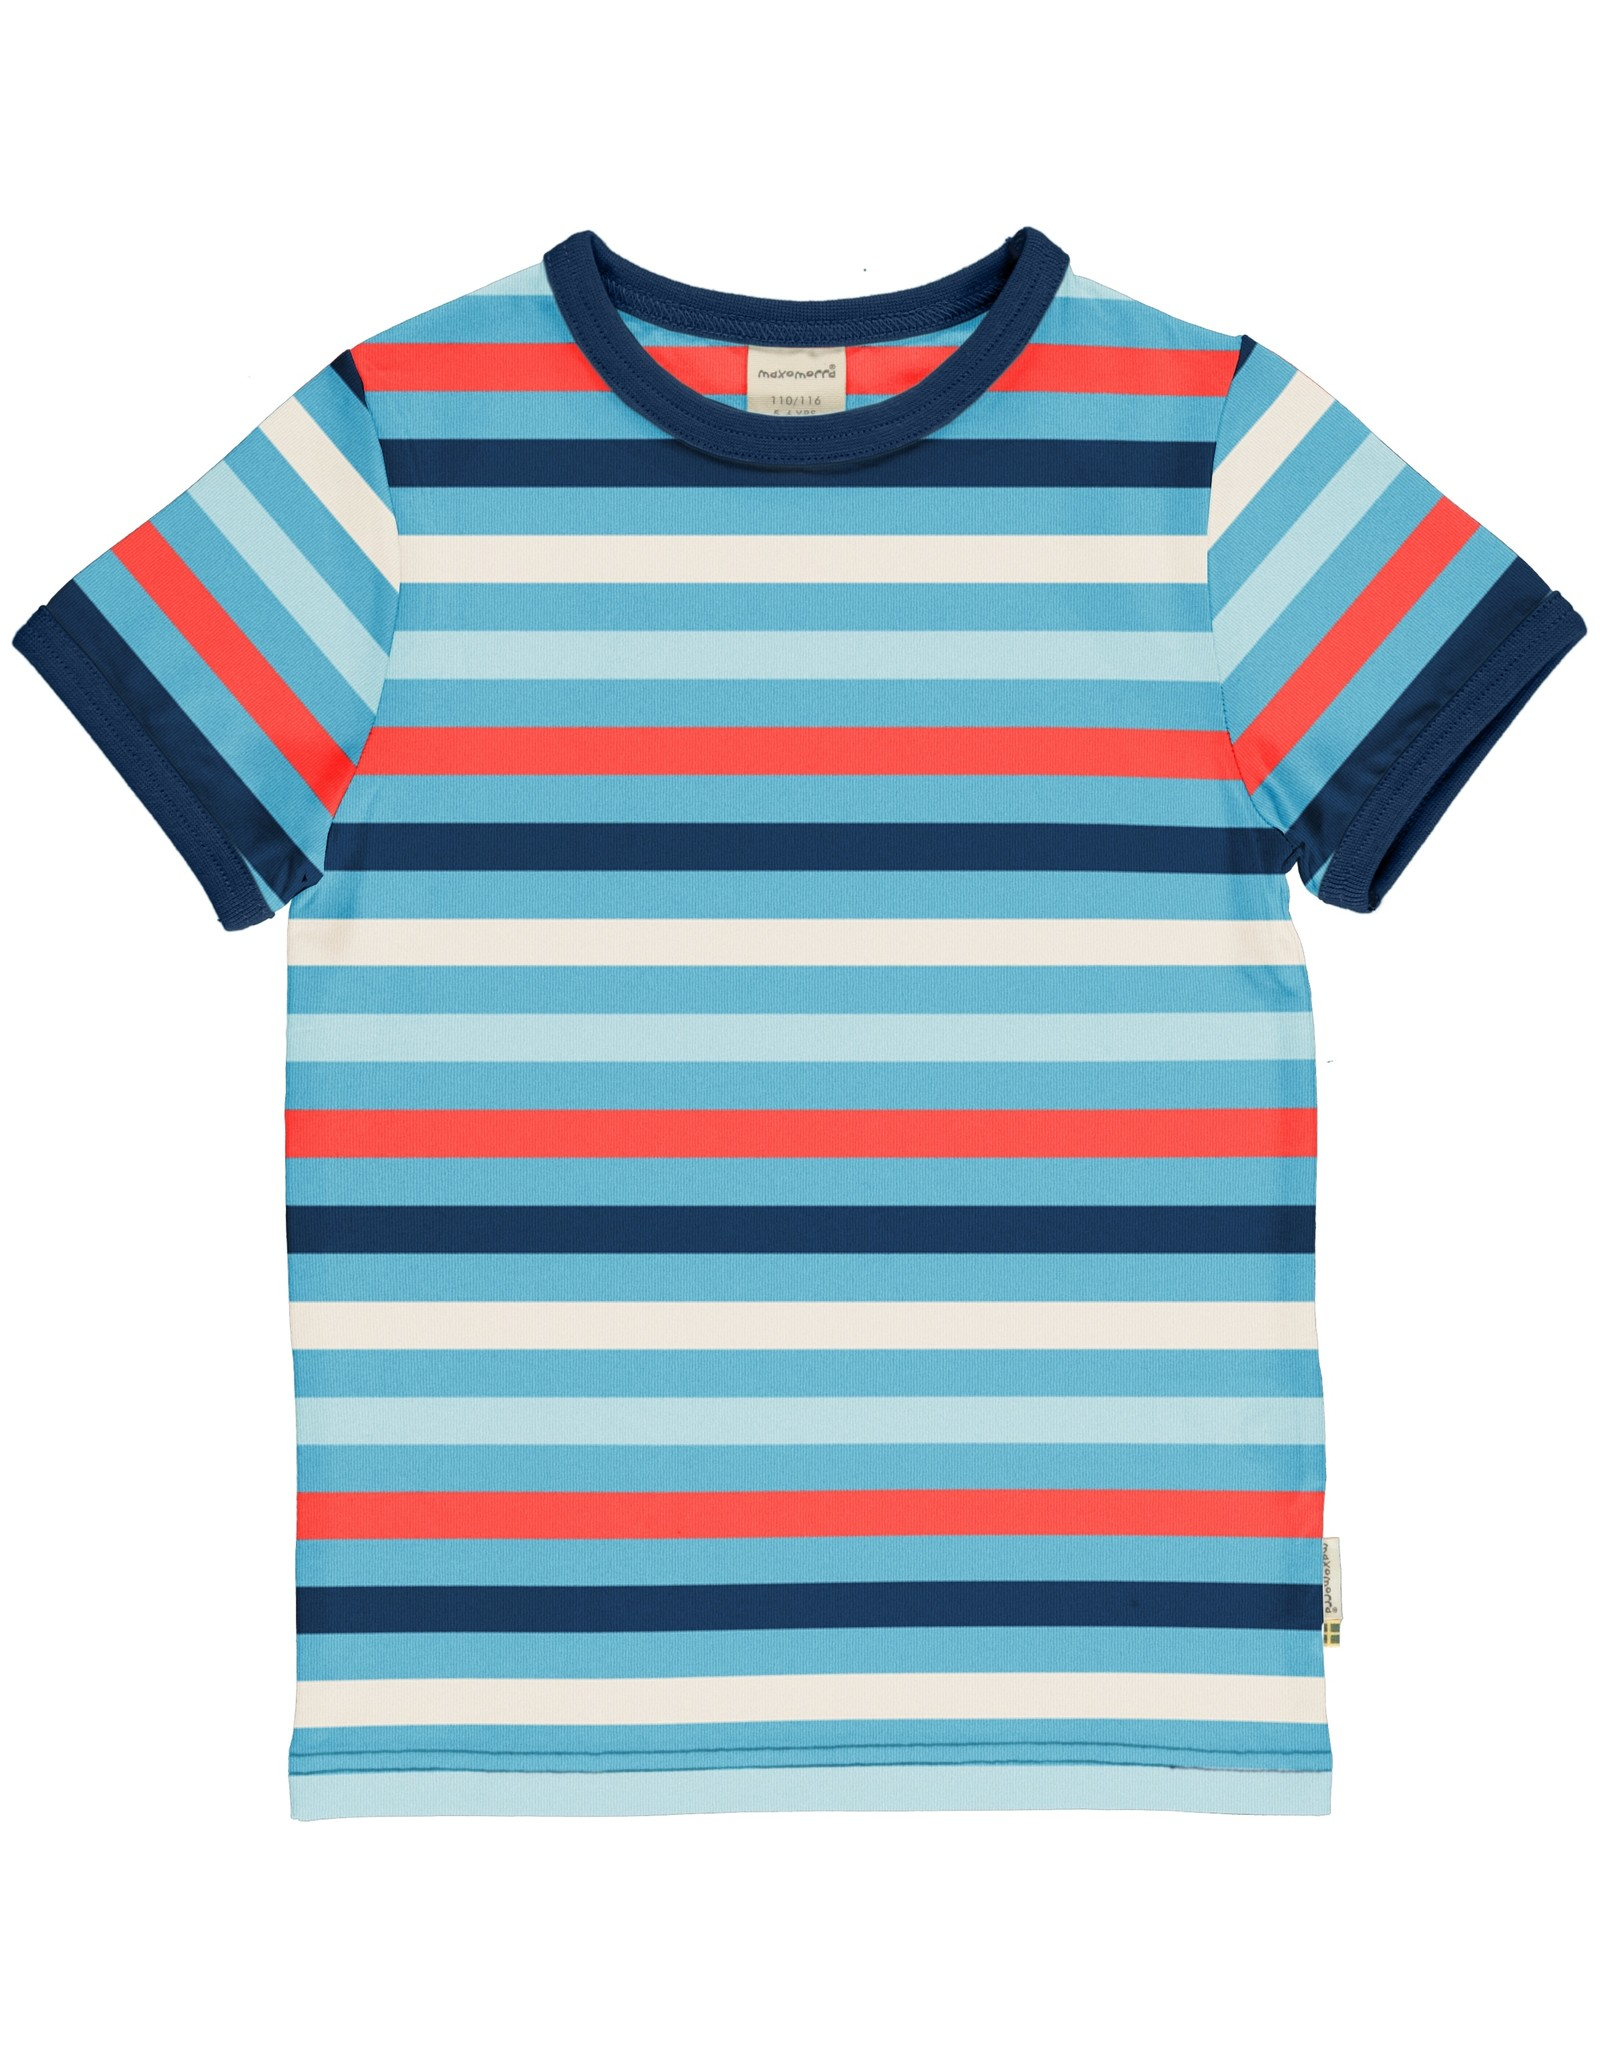 Maxomorra Maxomorra SS Stripe T Shirt